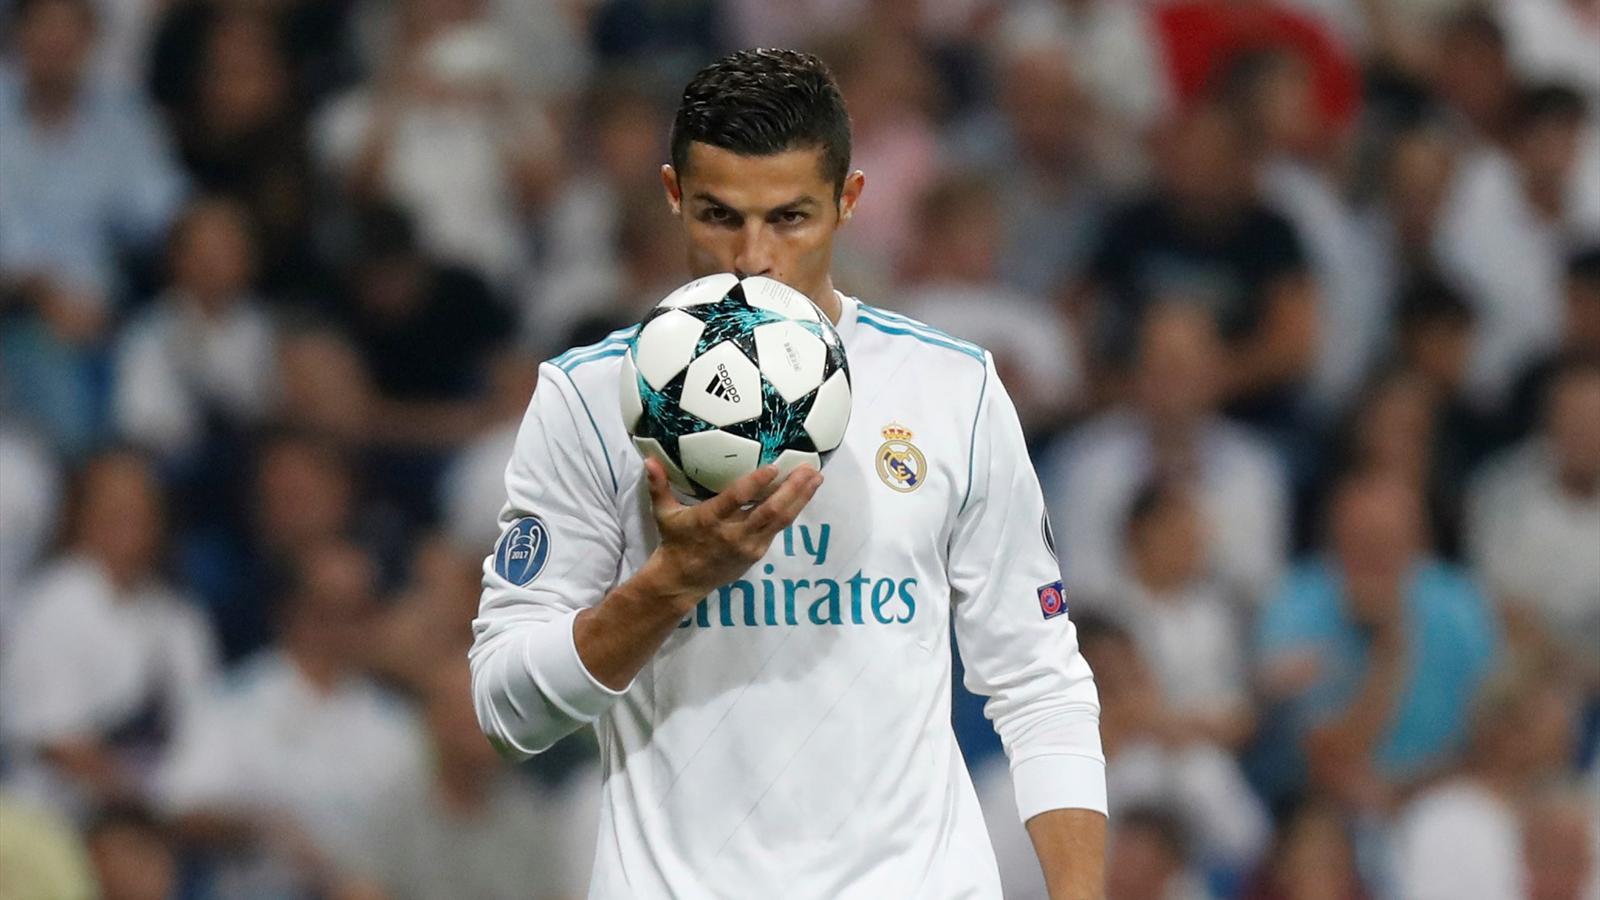 3d Golf Wallpaper For The Home Zinedine Zidane Real Madrid Forward Cristiano Ronaldo Is